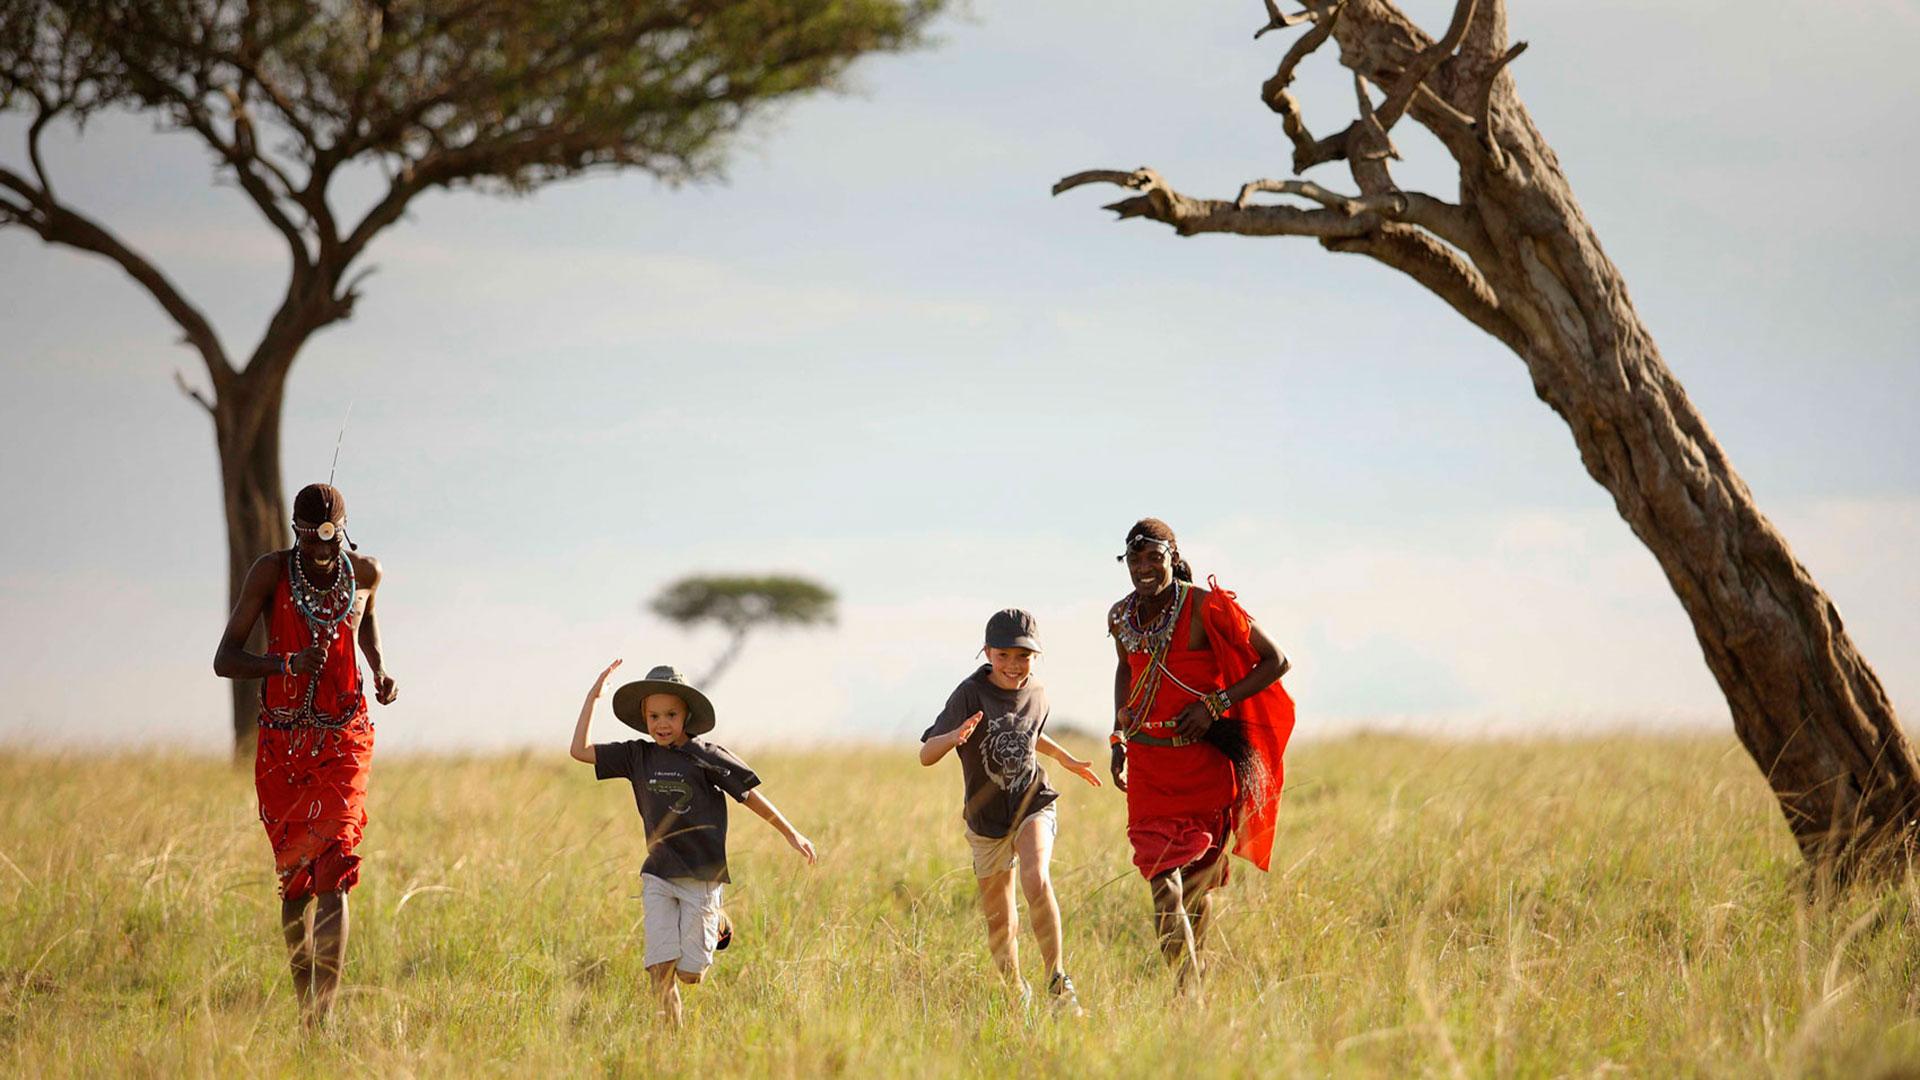 Los Viajes en Familia de Nuba